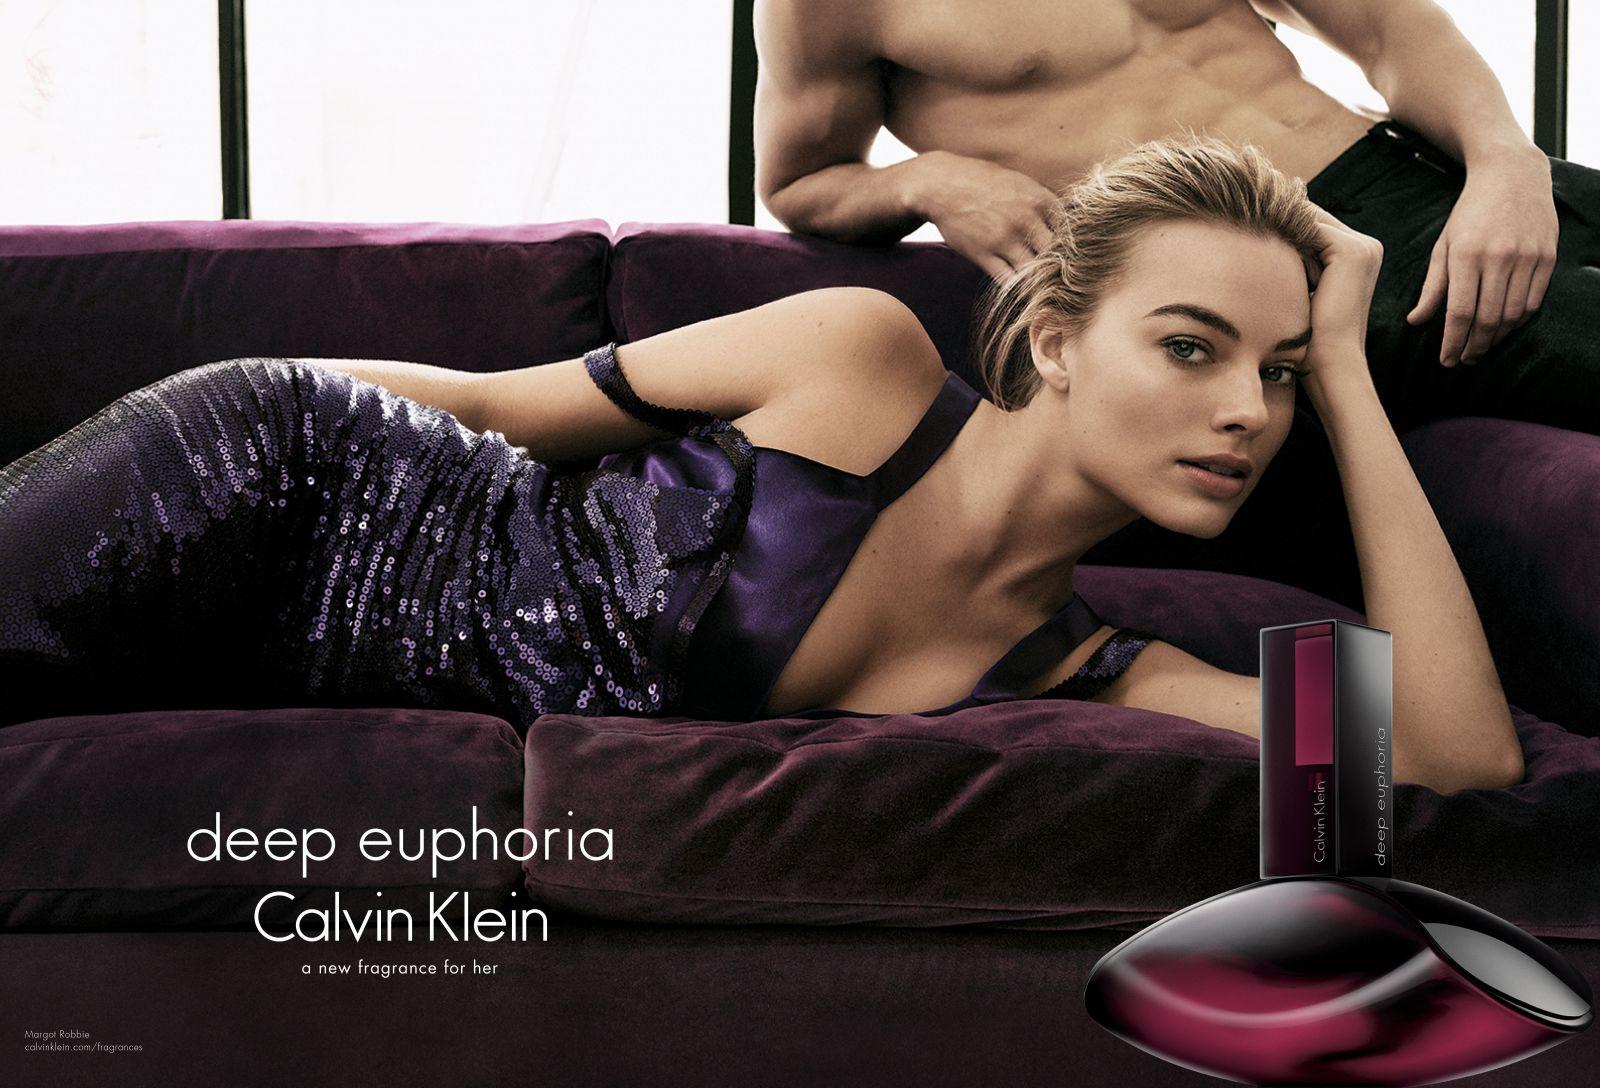 Марго Робби блеснула красотой в рекламе парфюма от Calvin Klein (ФОТО)